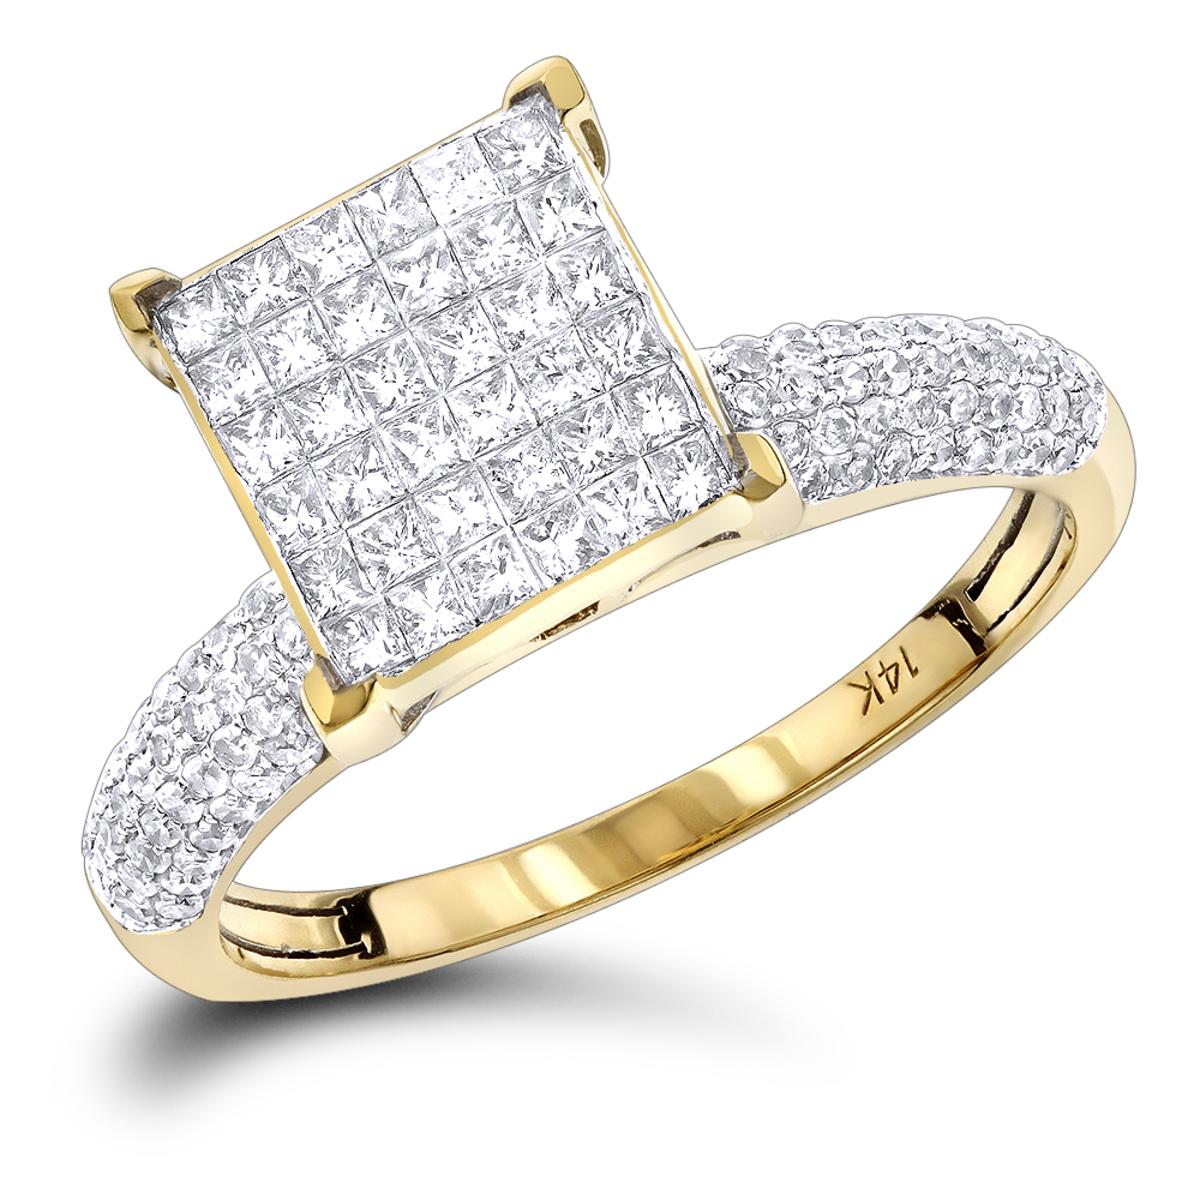 14K Round Princess Cut Diamond Engagement Ring 1.01ct